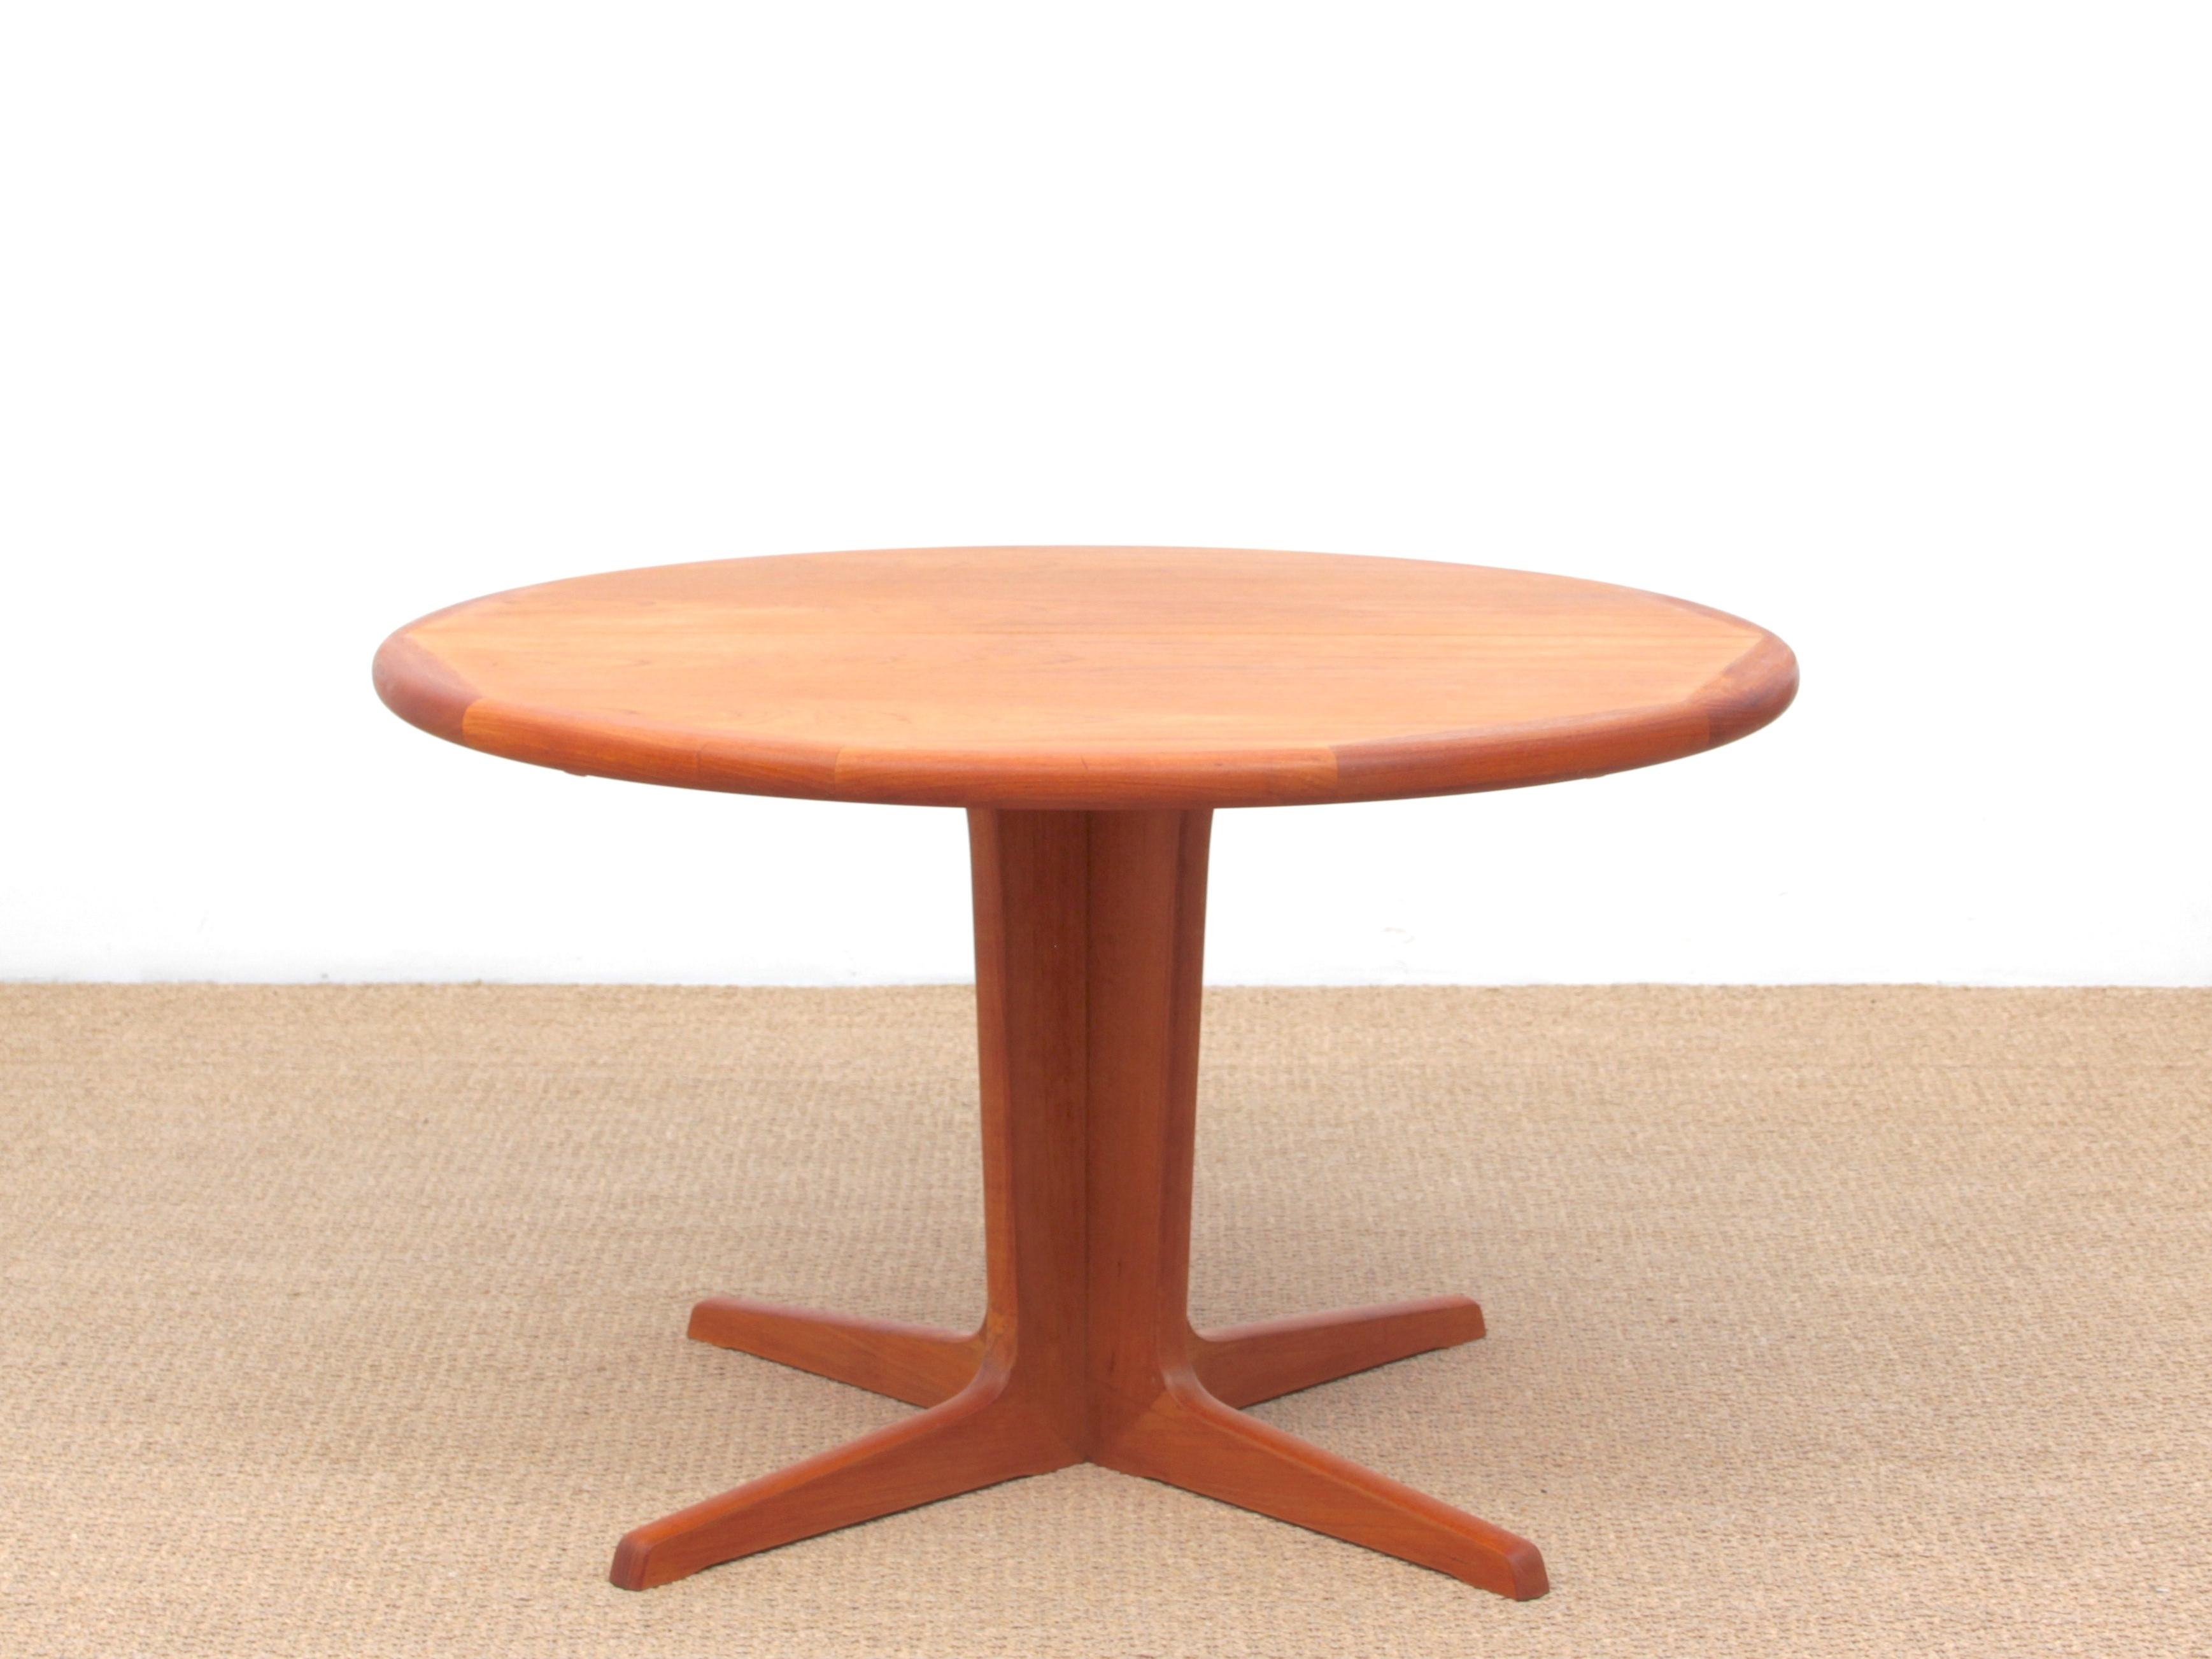 Mid Century Modern Scandinavian Round Dining Table In Teak 6 10